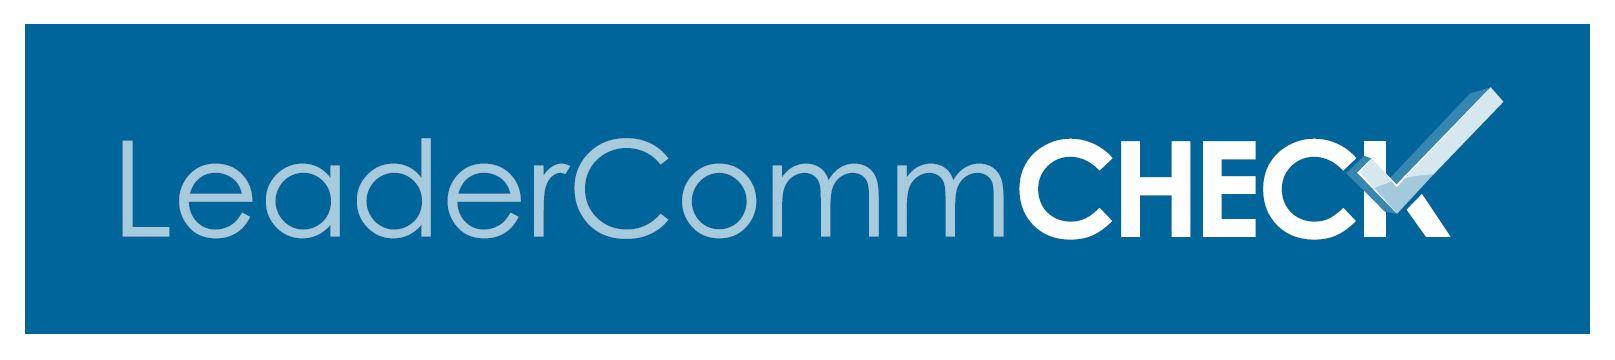 LeaderCommCheck-Website-The-Grossman-Group